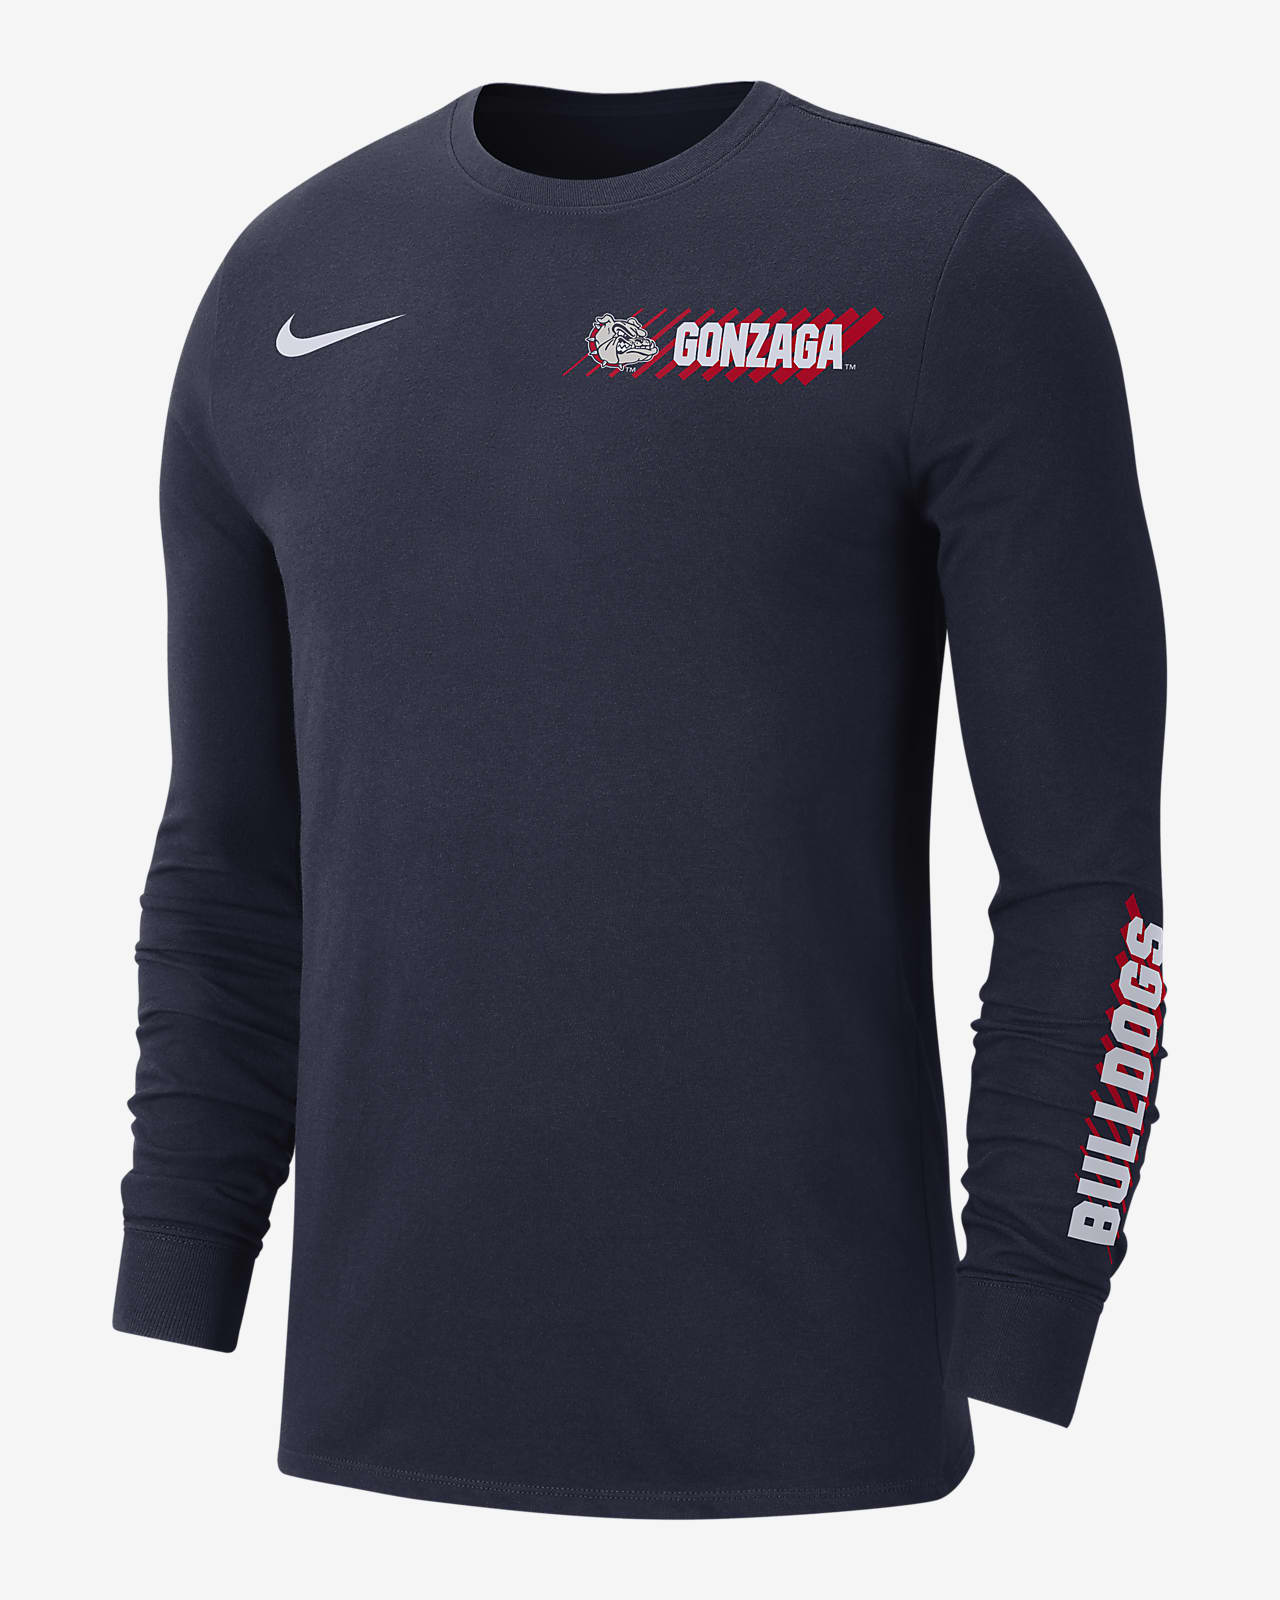 Nike College Dri-FIT (Gonzaga) Men's Long-Sleeve T-Shirt